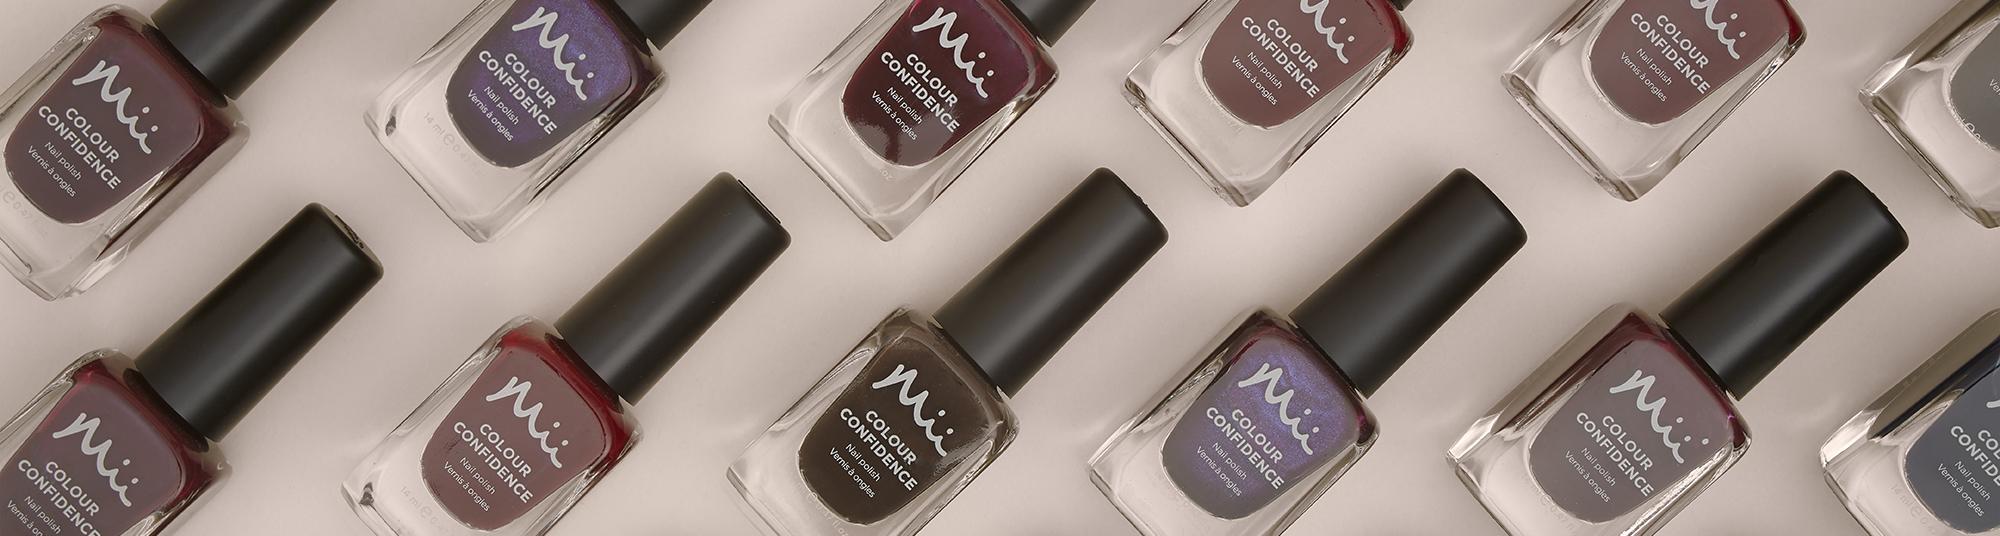 Mii Colour Confidence Nail Polish Dark Category